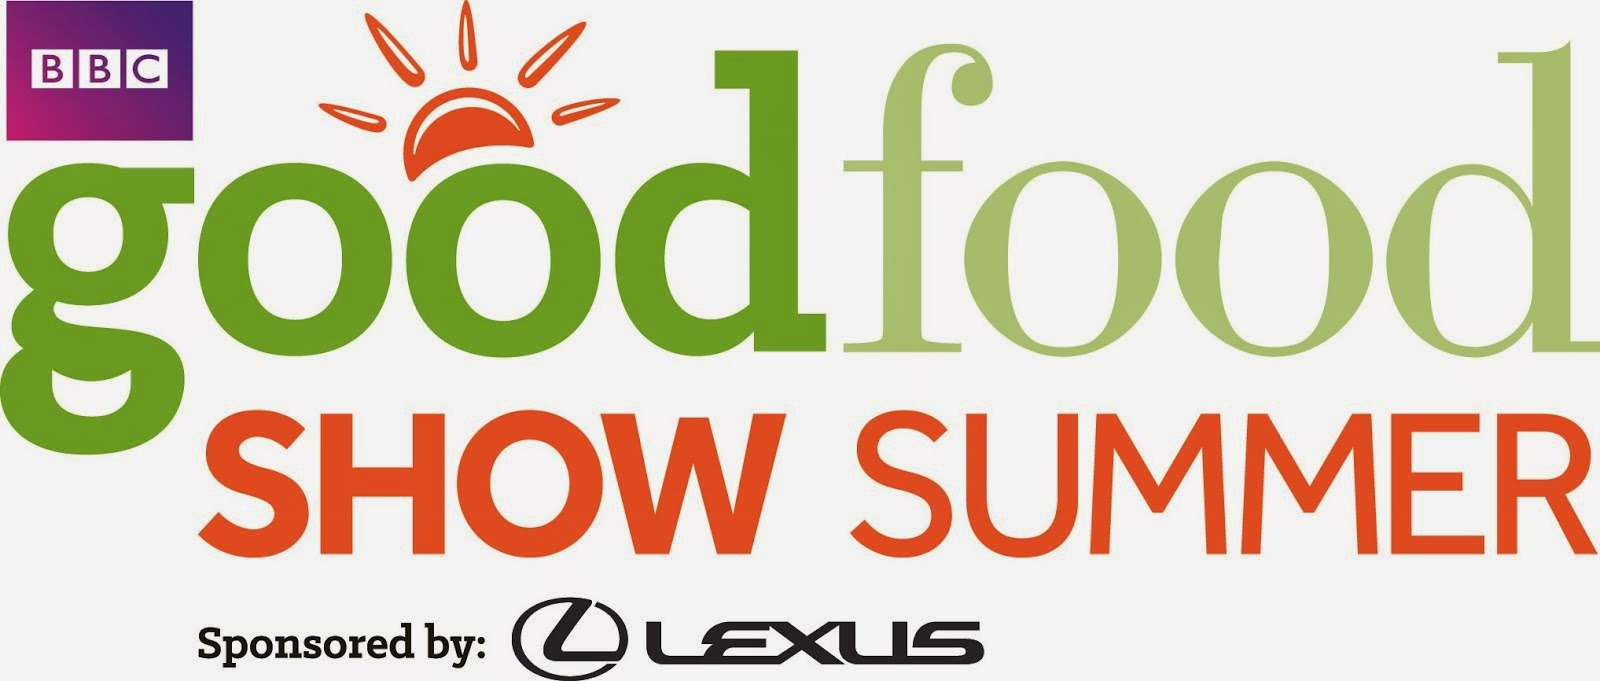 BBC Good Food Show Summer ticket GIVEAWAY